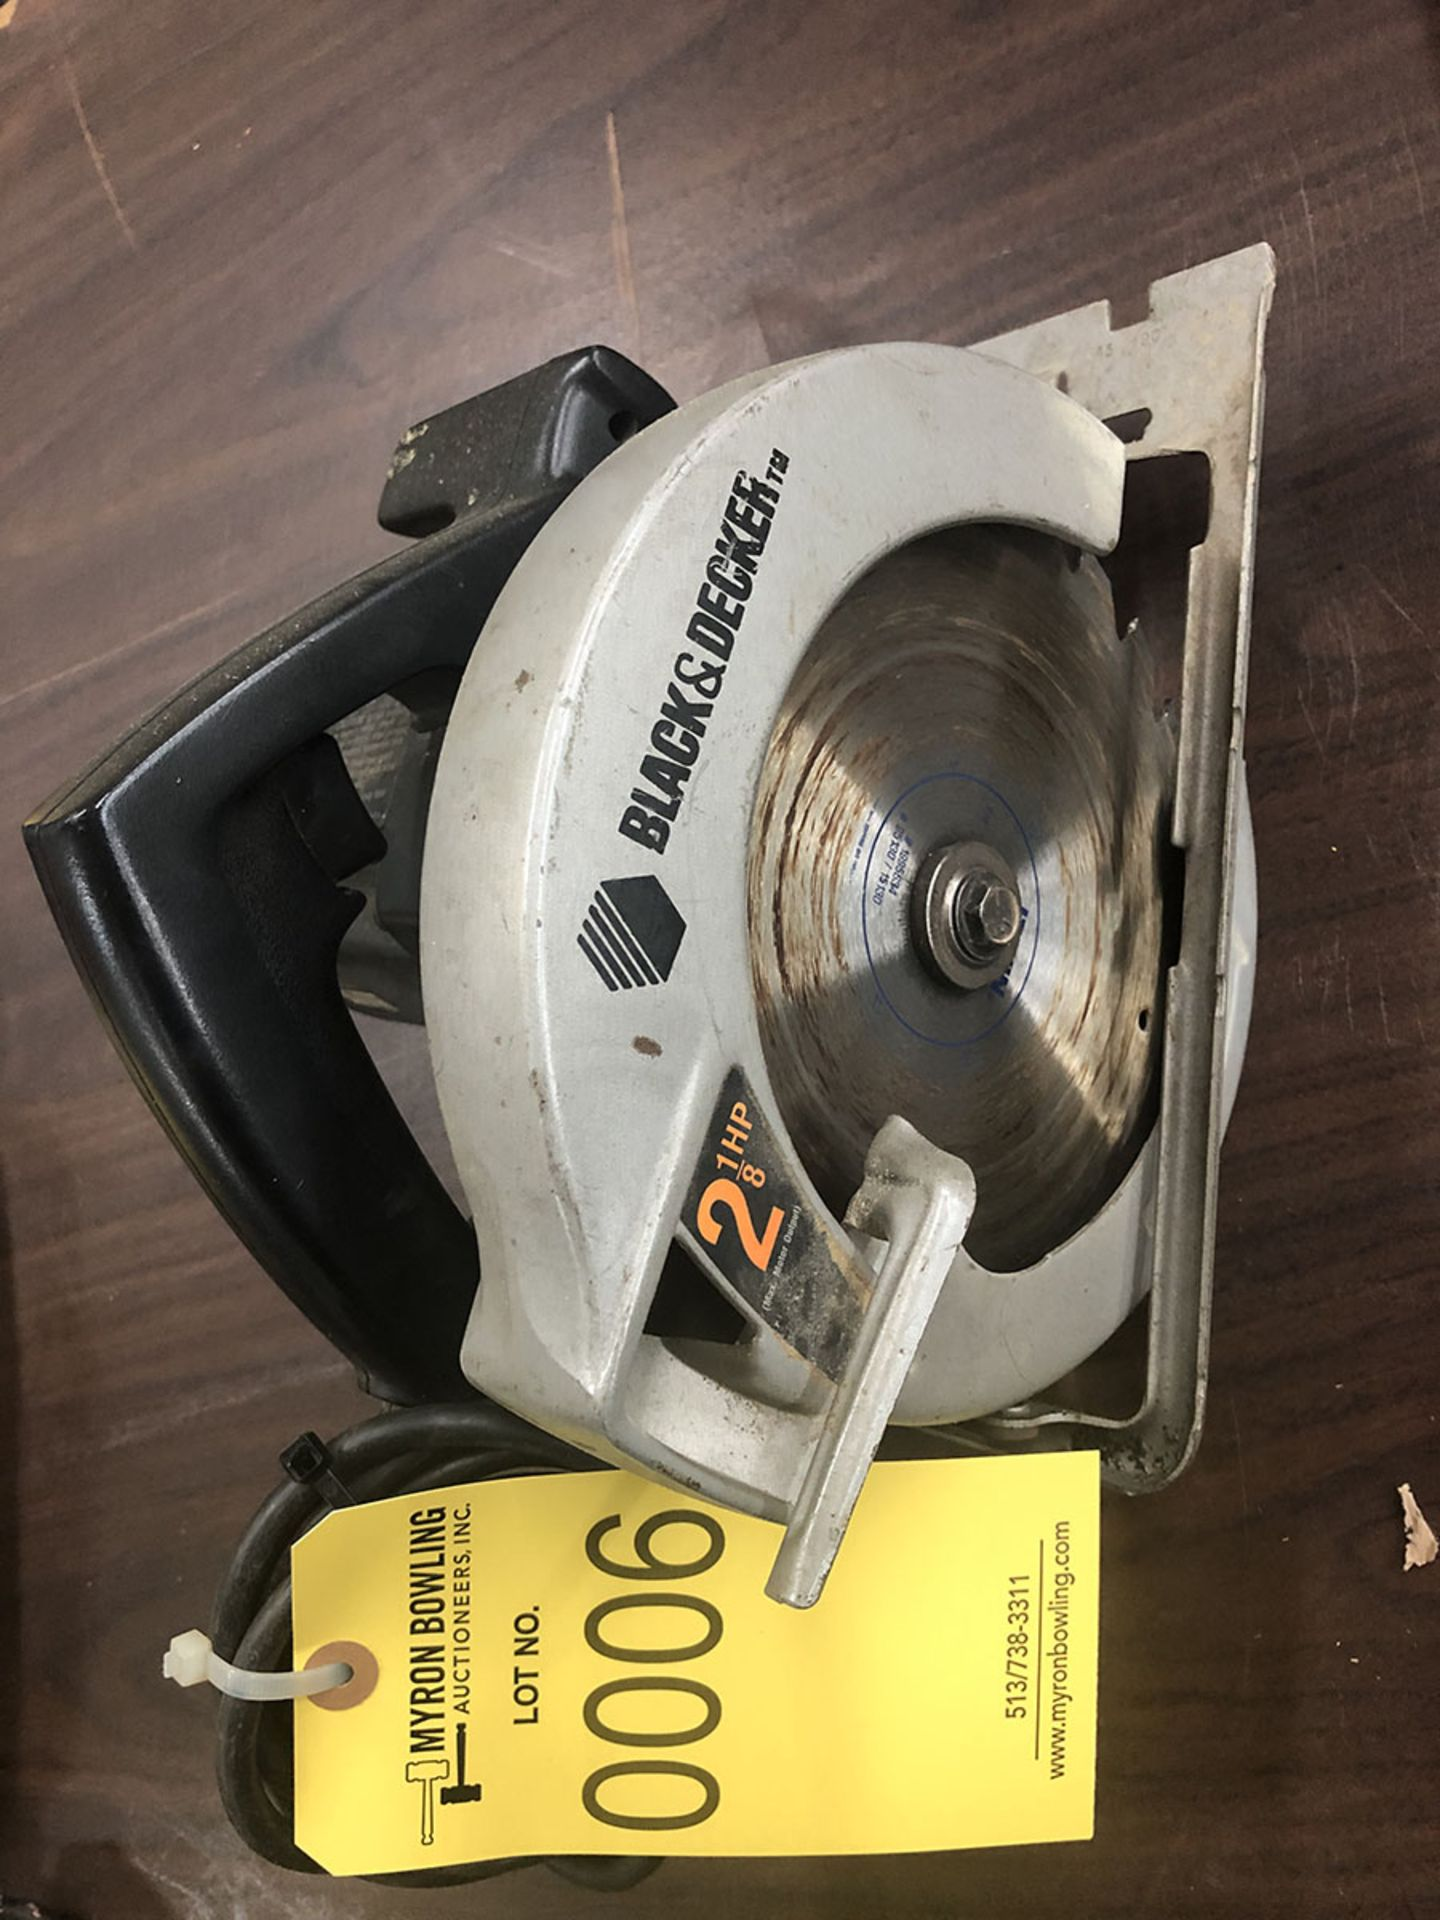 Lot 6 - BLACK & DECKER ELECTRIC 7 1/4'' CIRCULAR SAW; 5,300 RPM, 2 1/8 HP